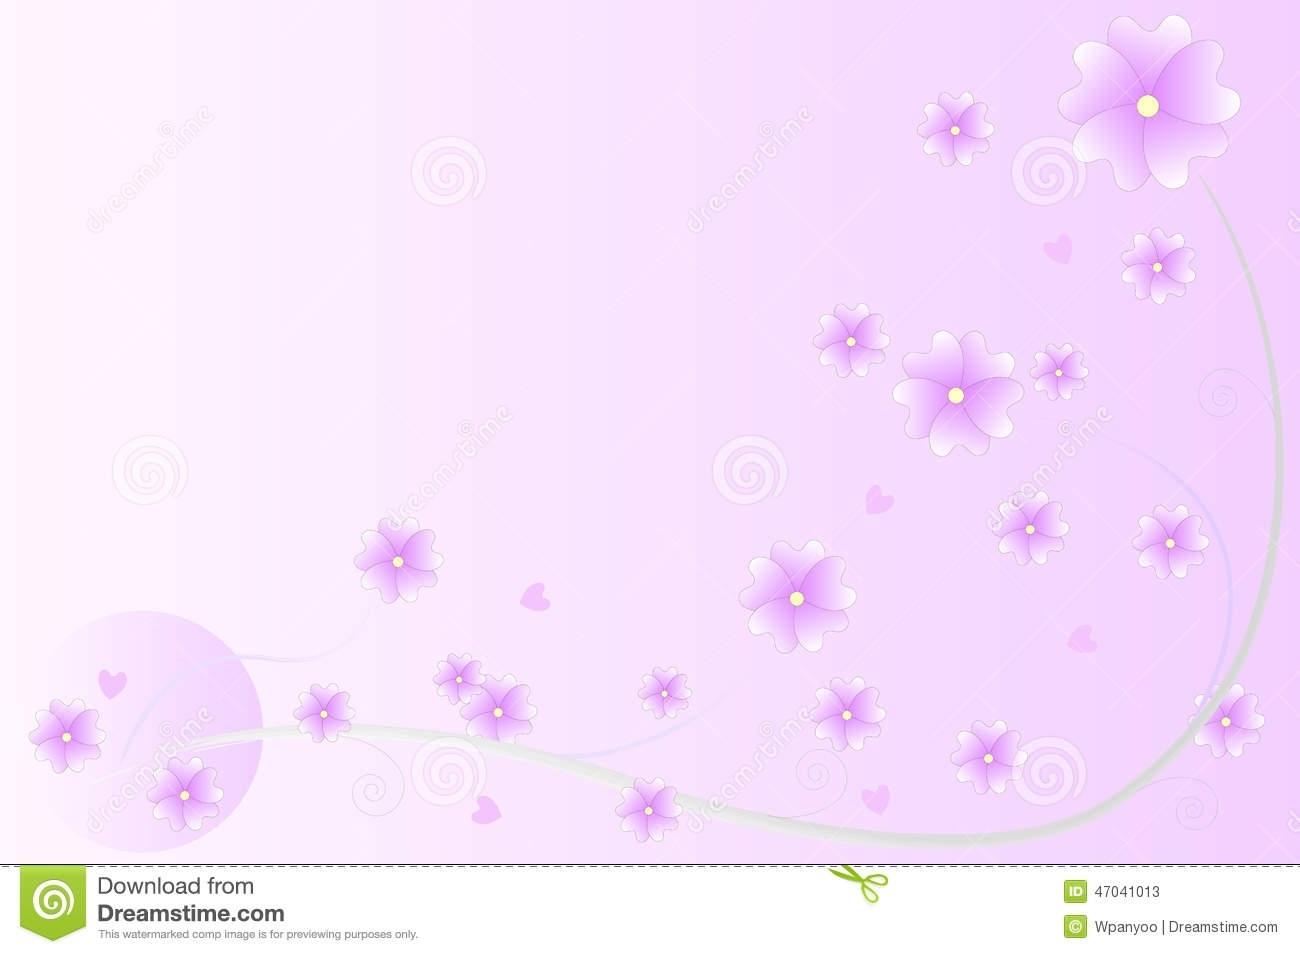 purple flowers background stock vector. illustration of illustration